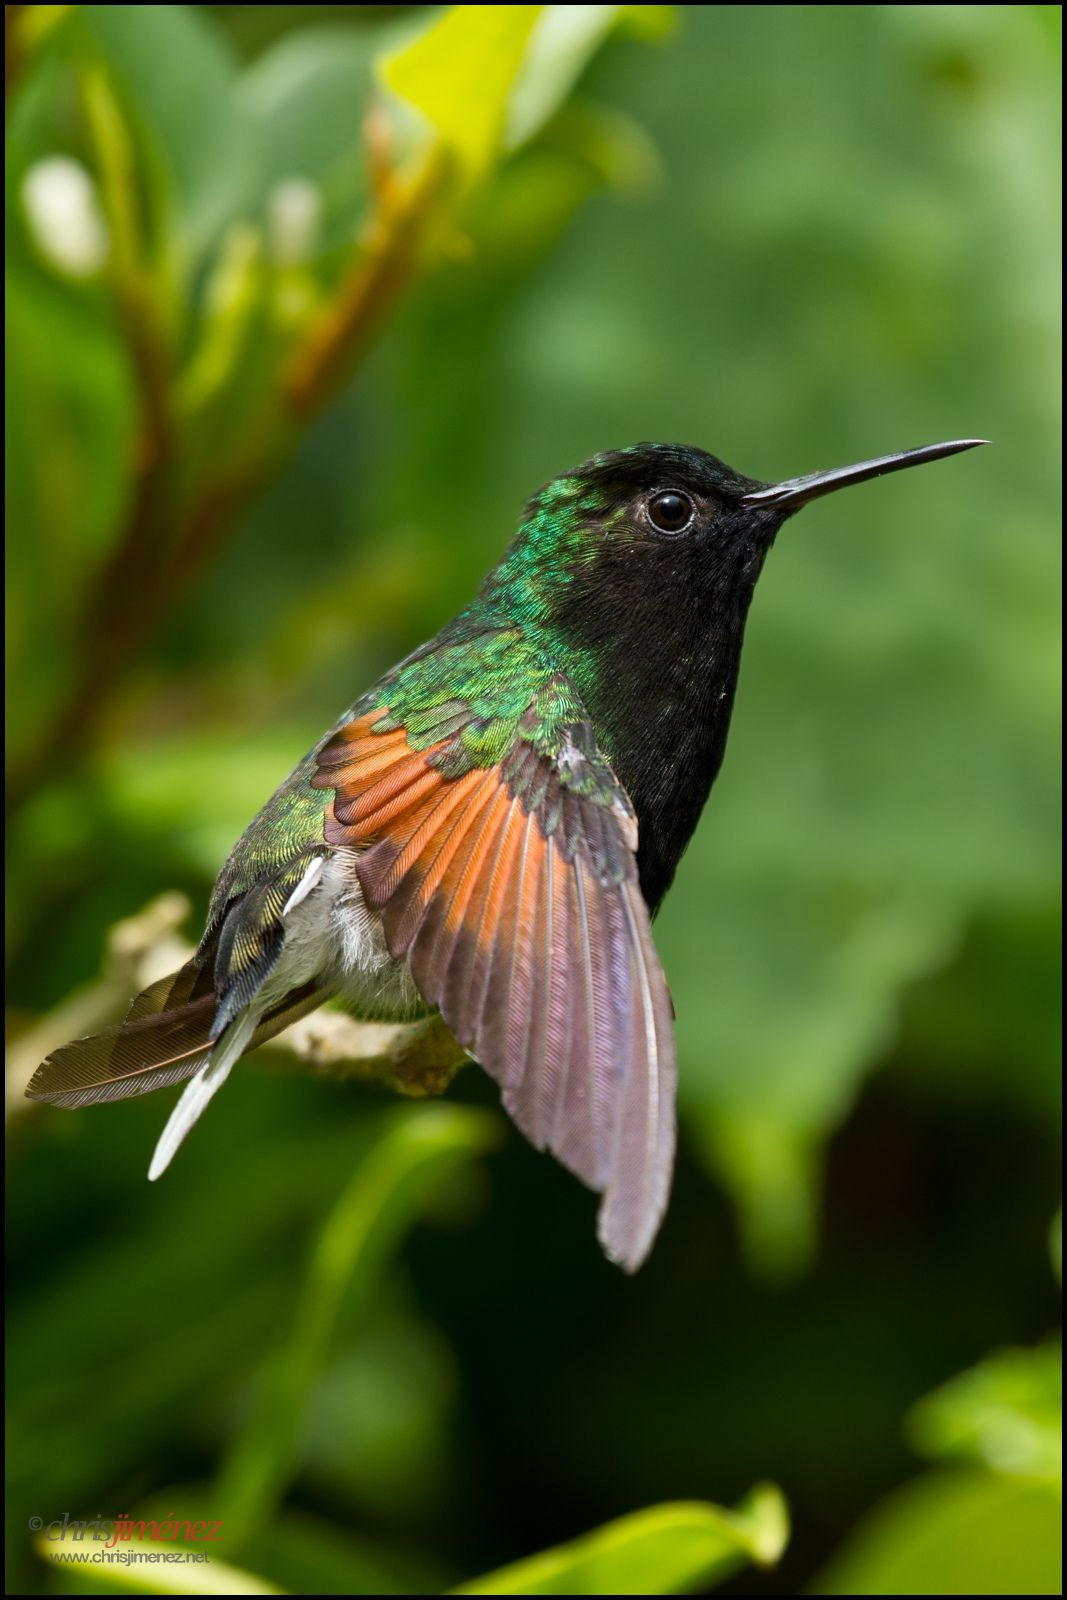 Blackbellied Hummingbird Hummingbird, Hummingbird